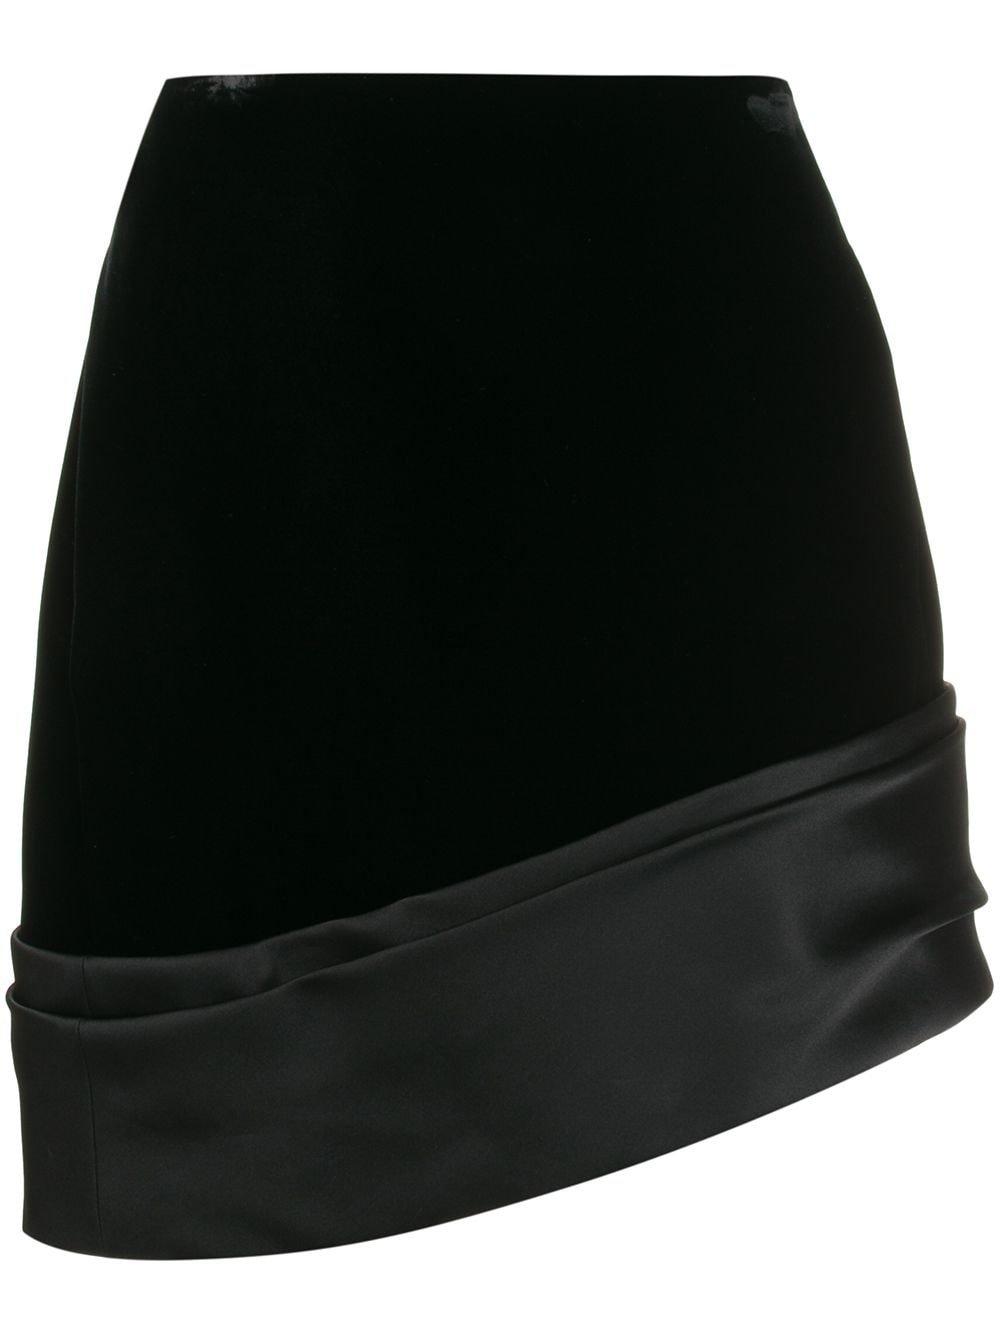 Saint Laurent Asymmetric Mini Skirt | Farfetch.com